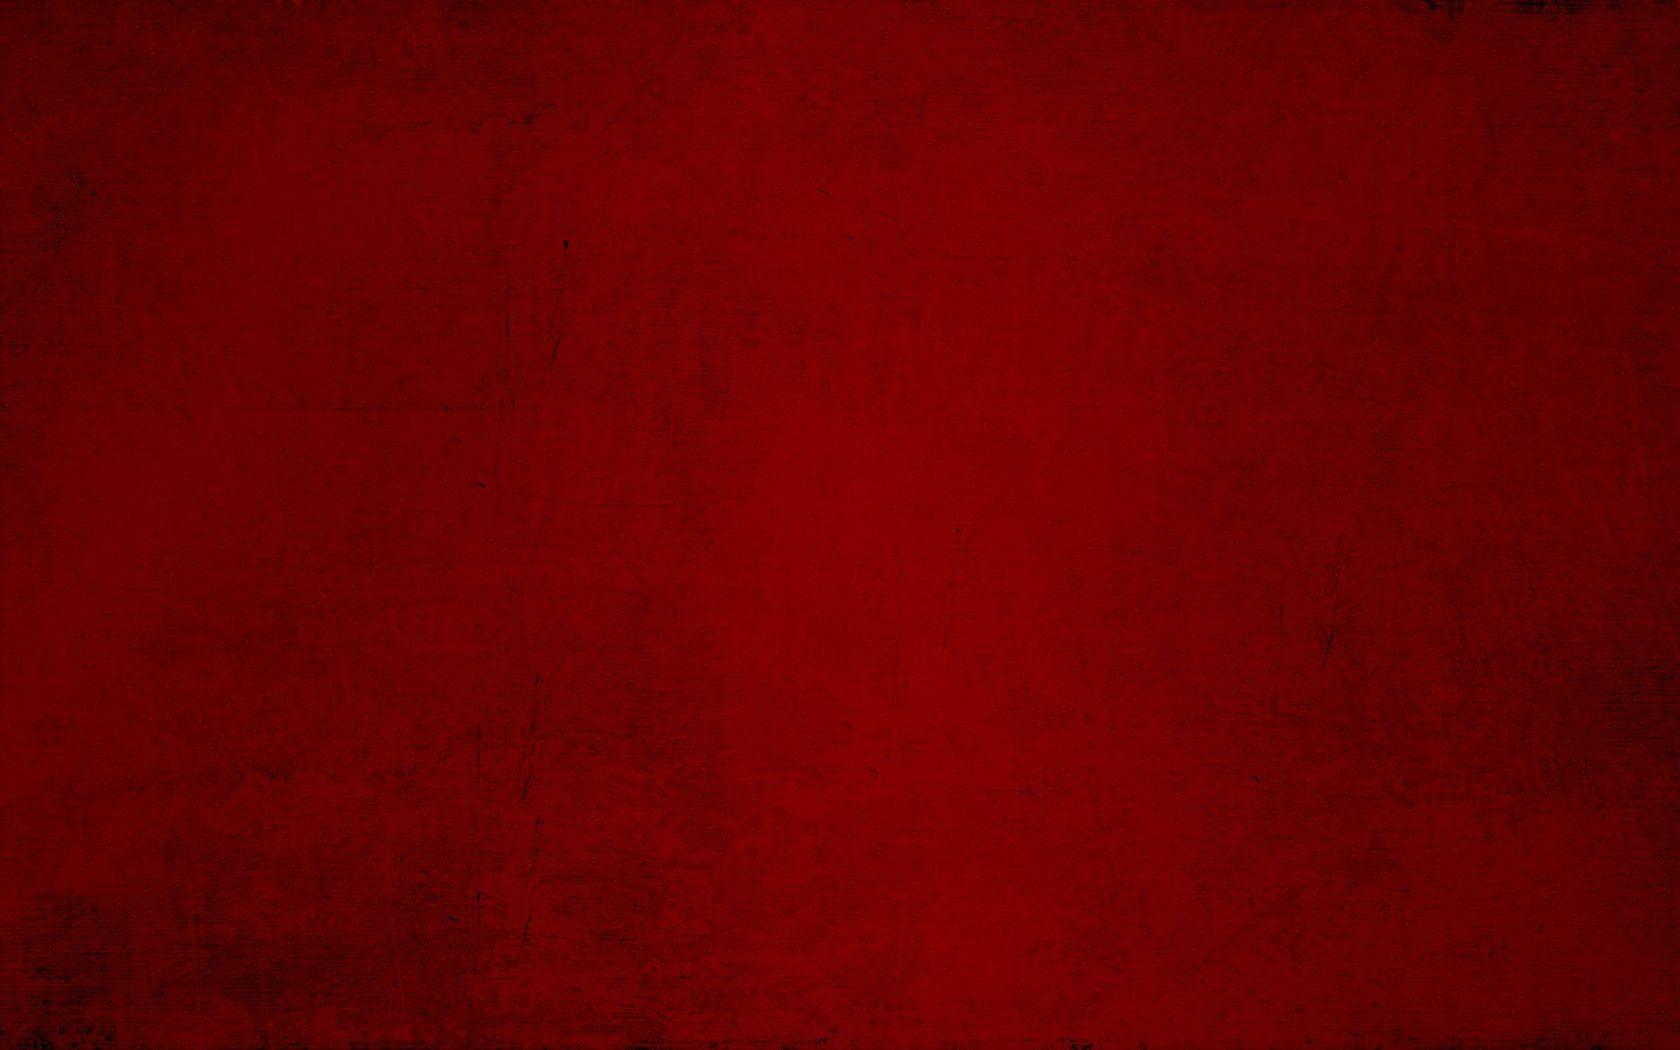 Red texture wallpaper 14429 1680x1050